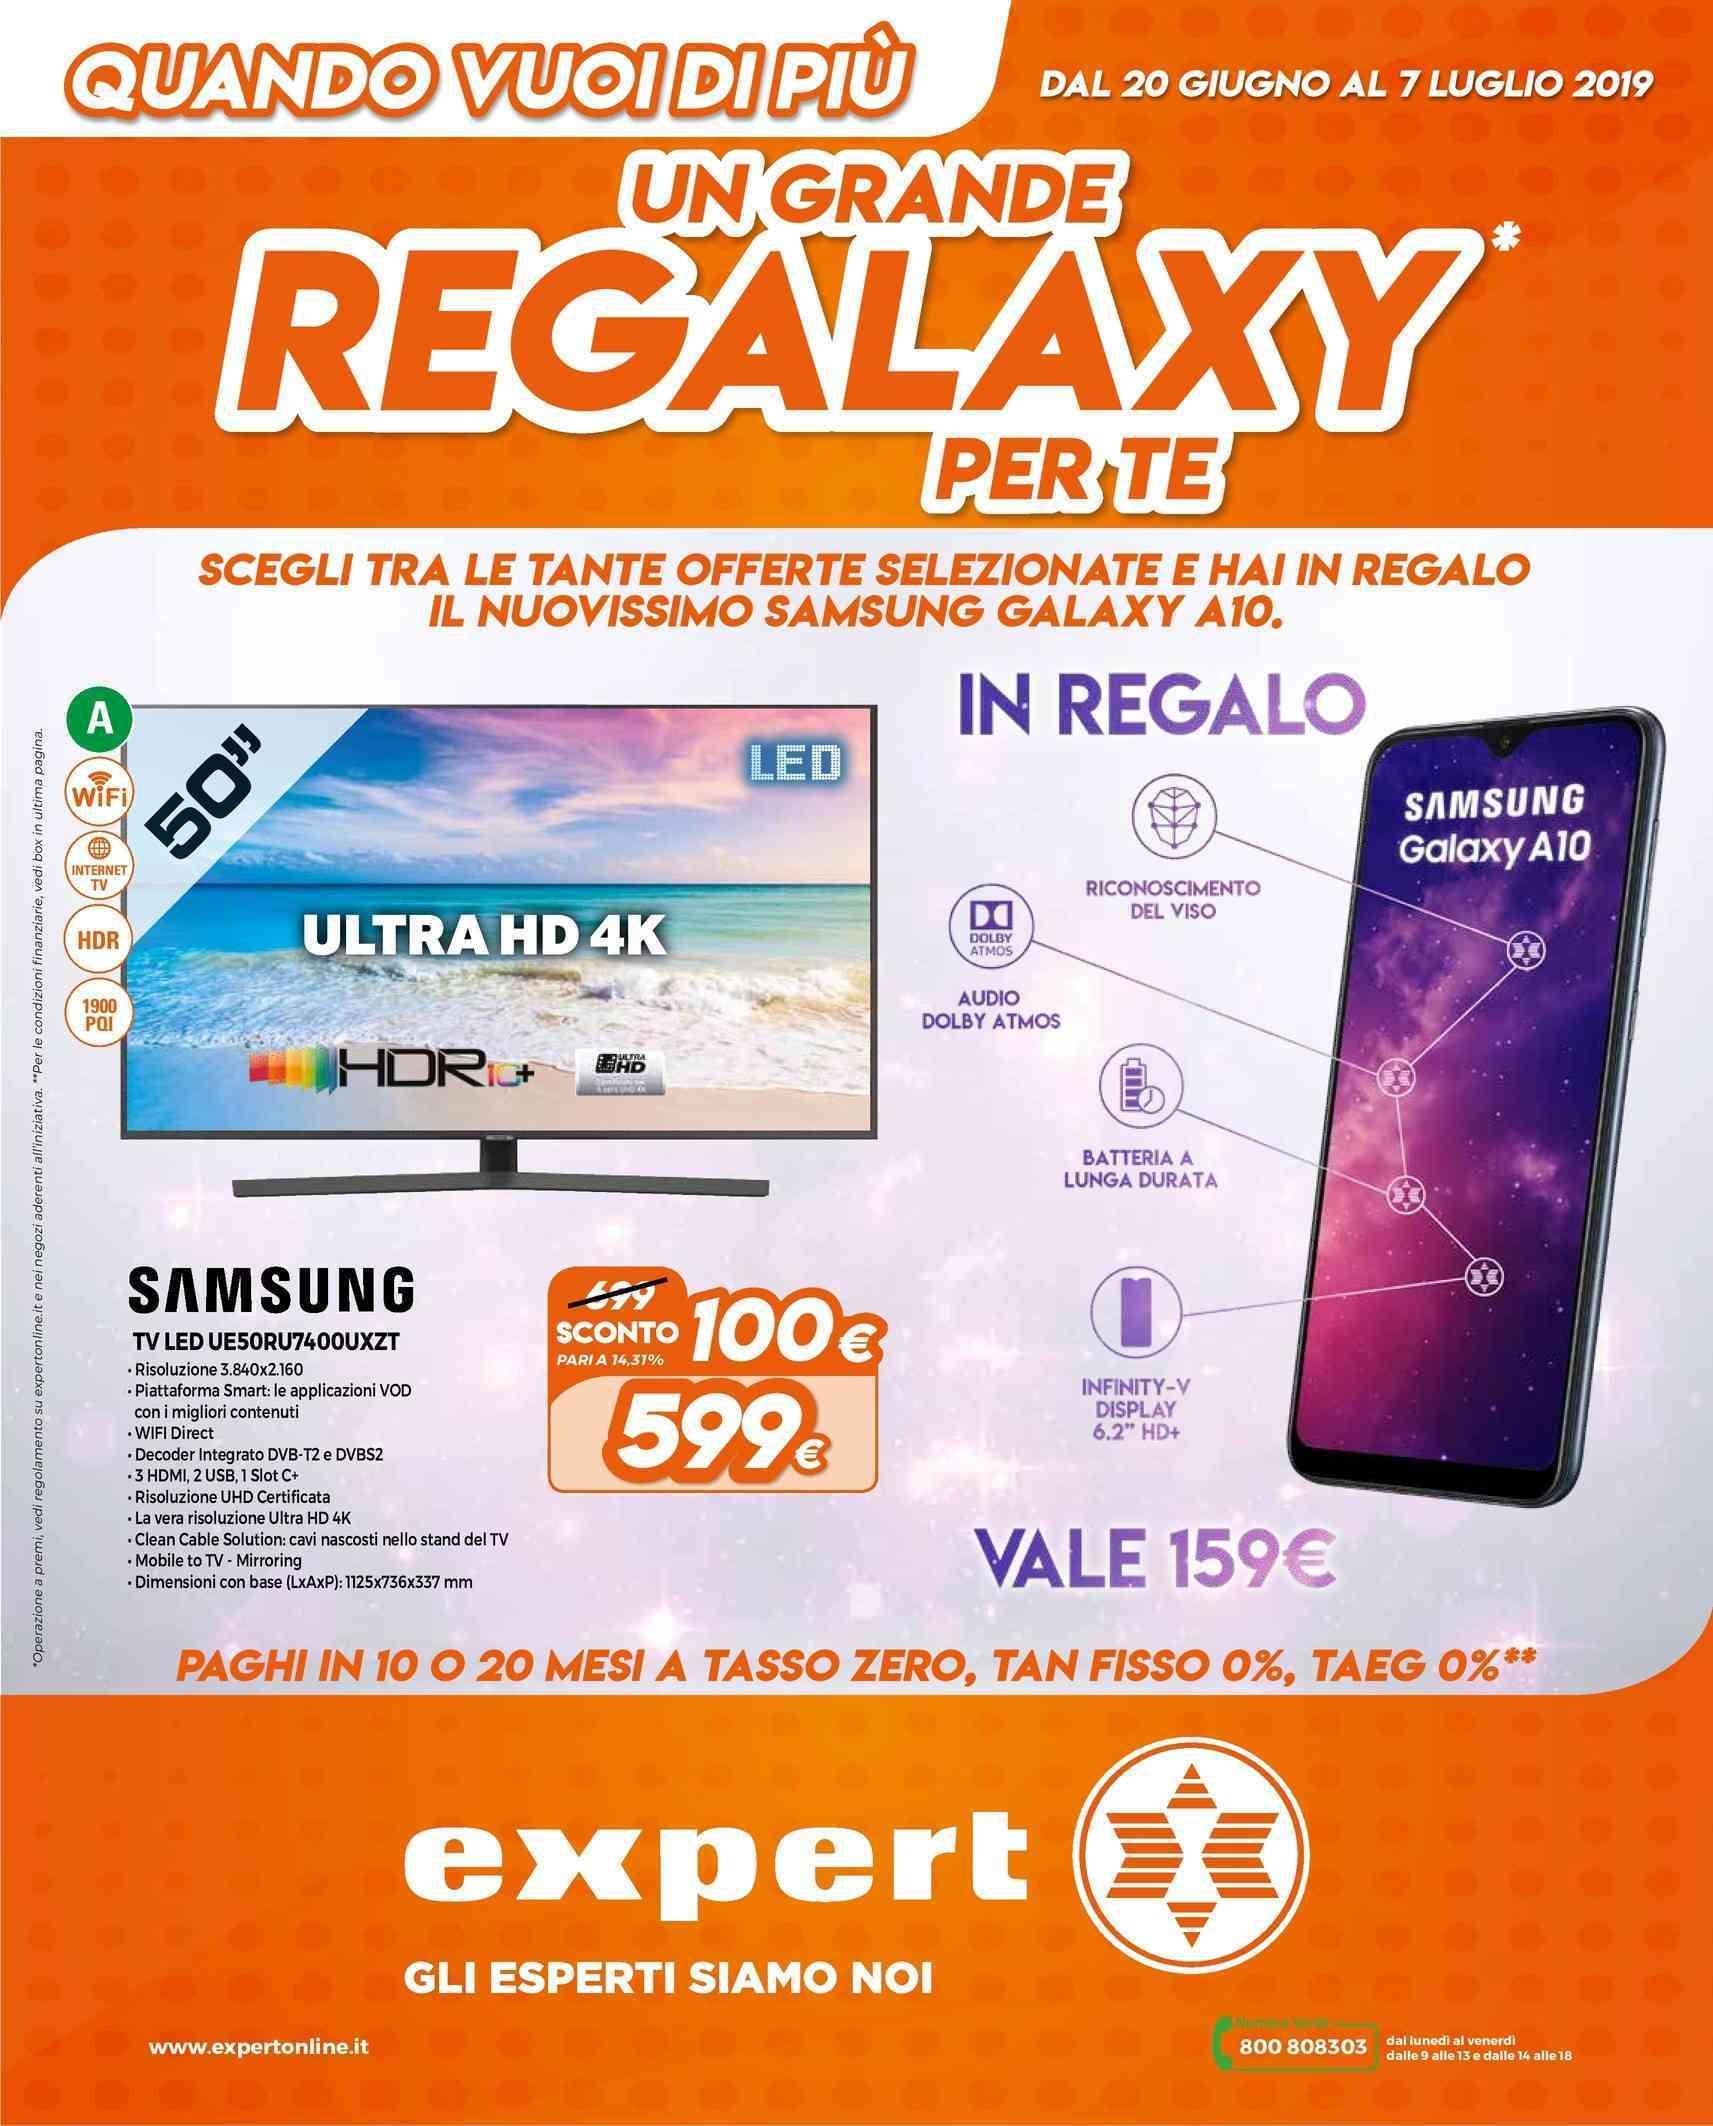 volantino expert regalaxy giugno 2019 (1)